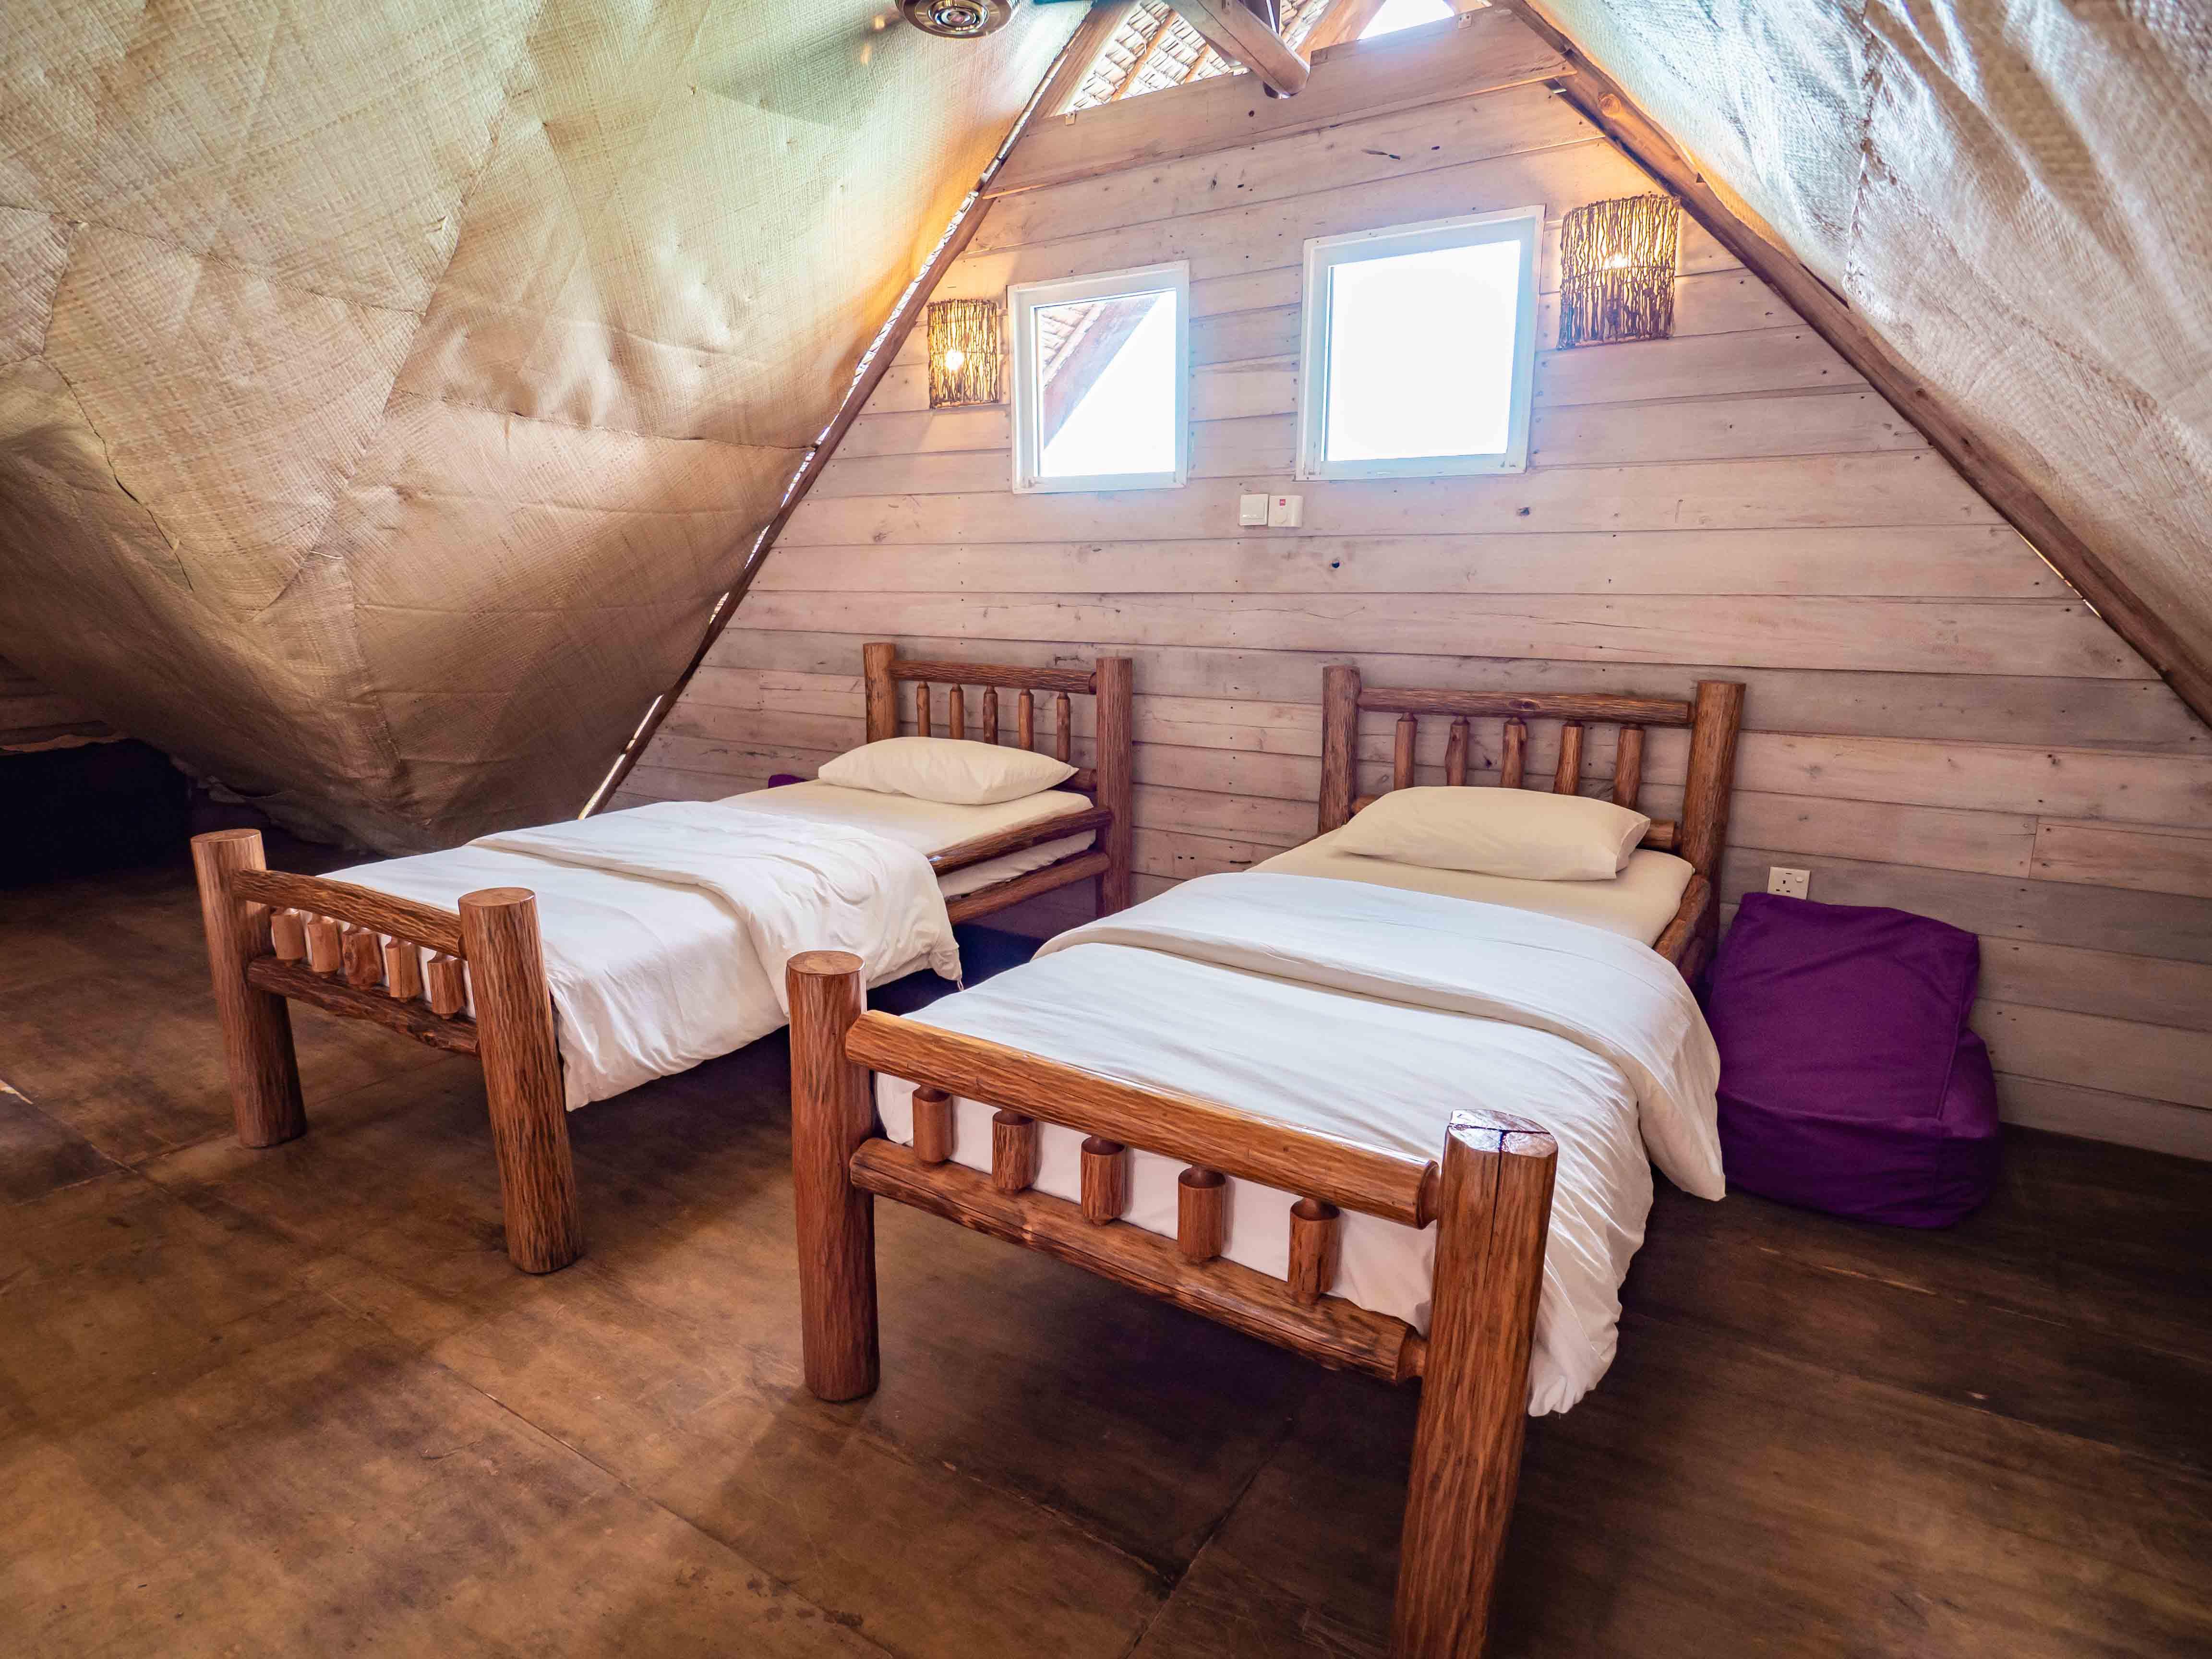 villa room, Telunas Private Island Batam Indonesia, Hotel Review